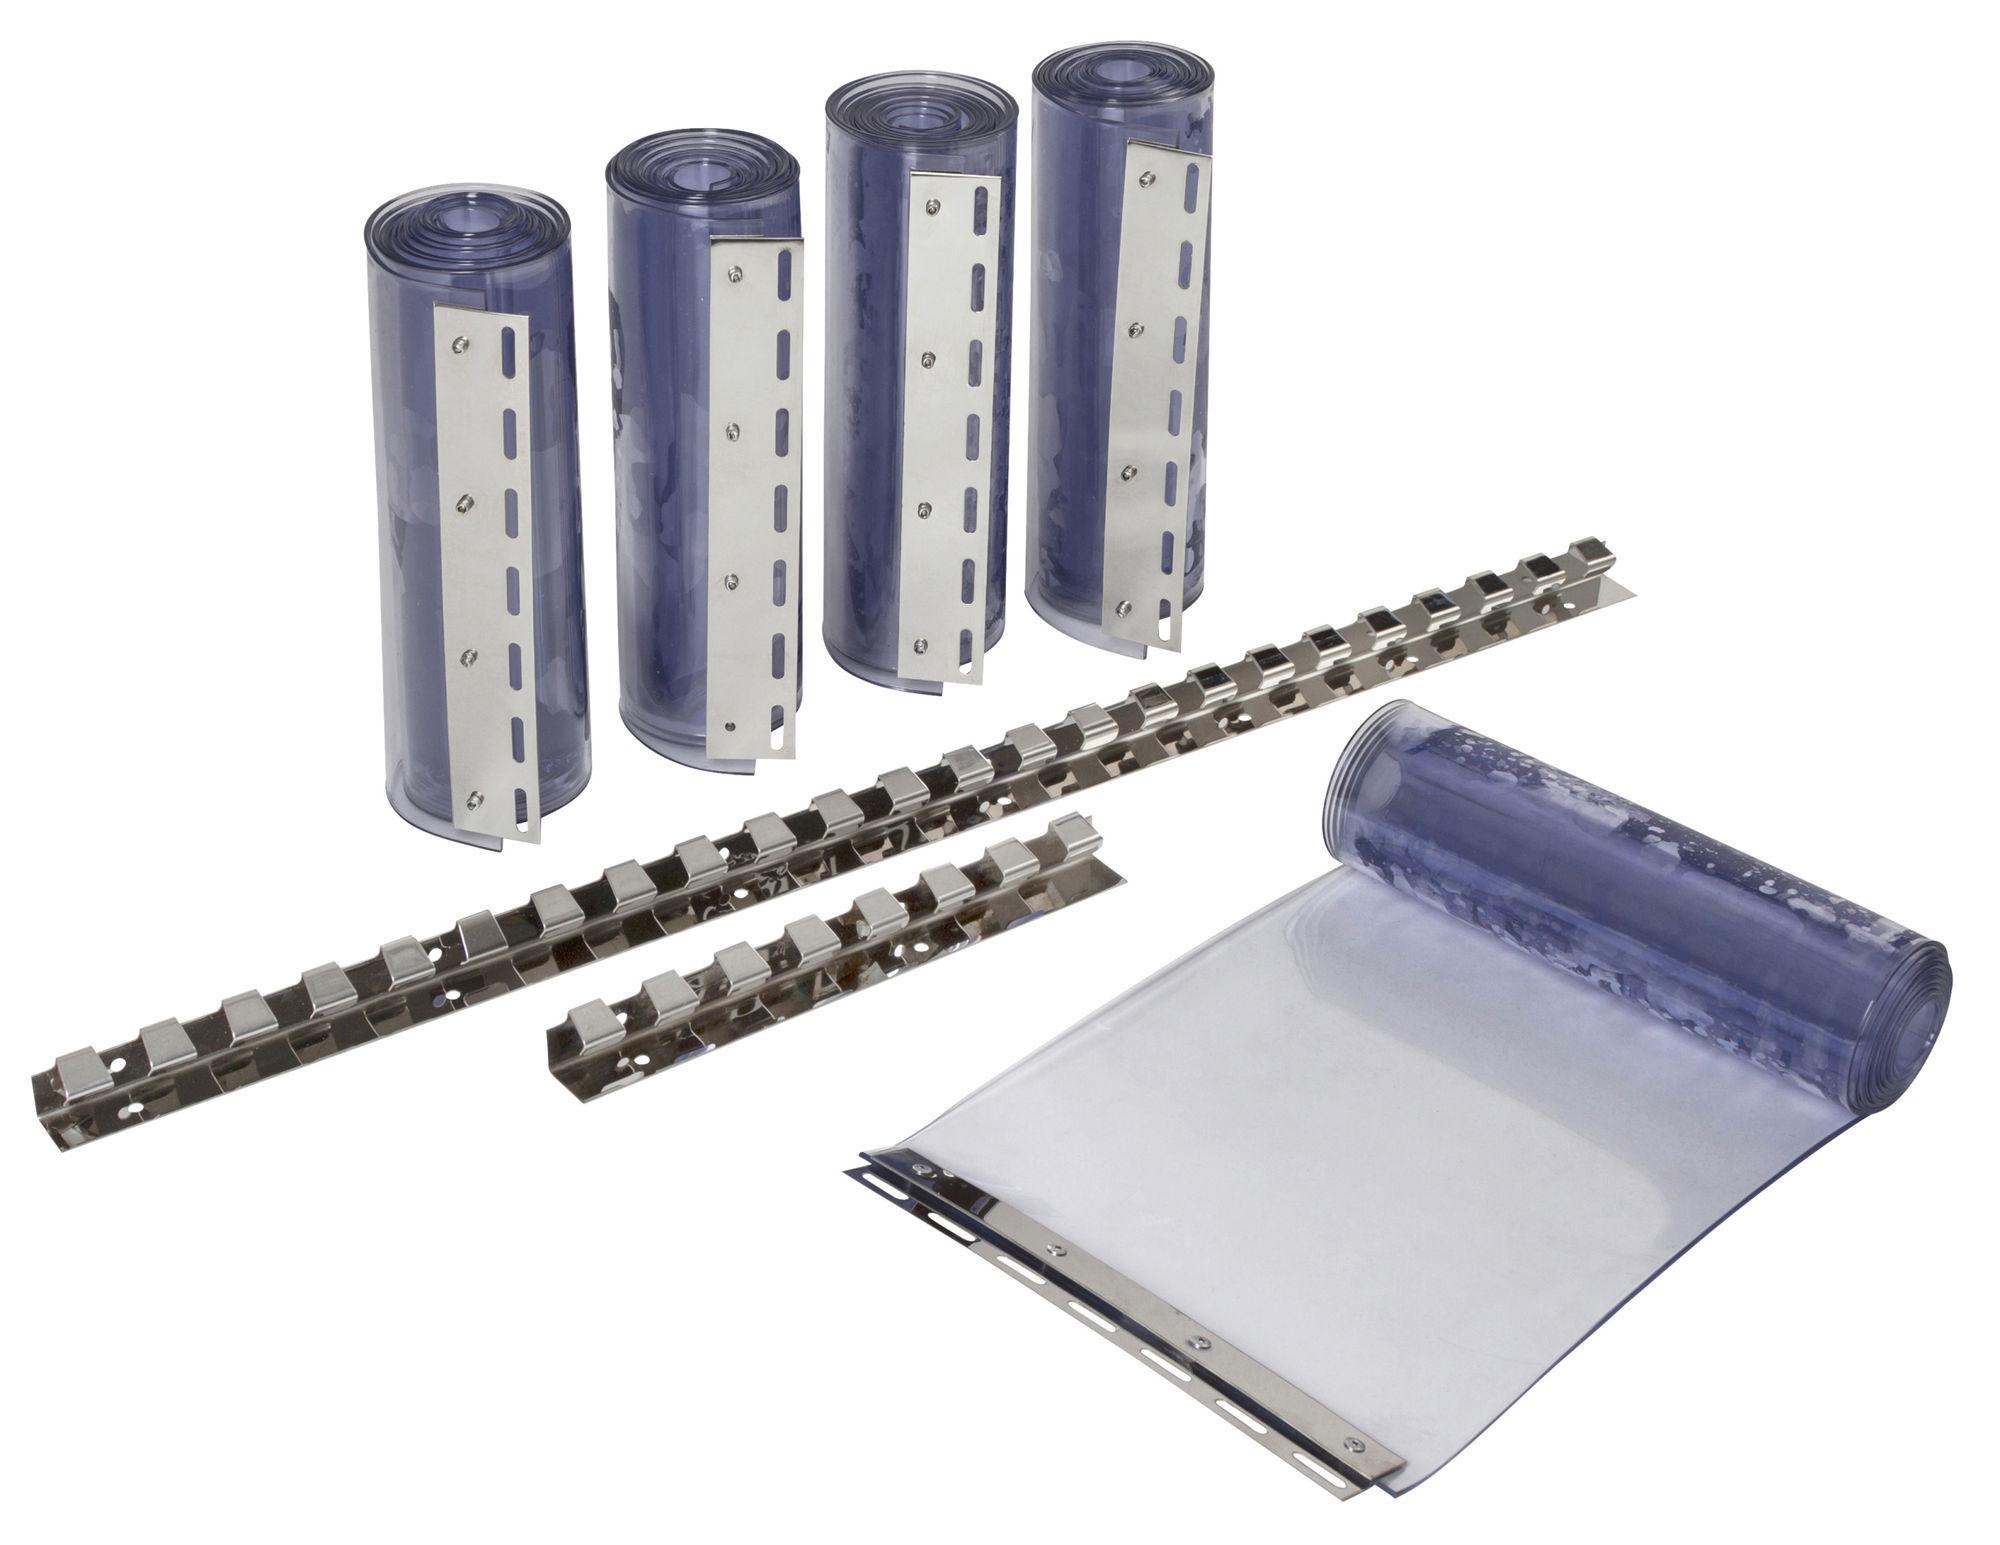 PVC-Streifenvorhangset 300 transparent 300x3mm, 225cm